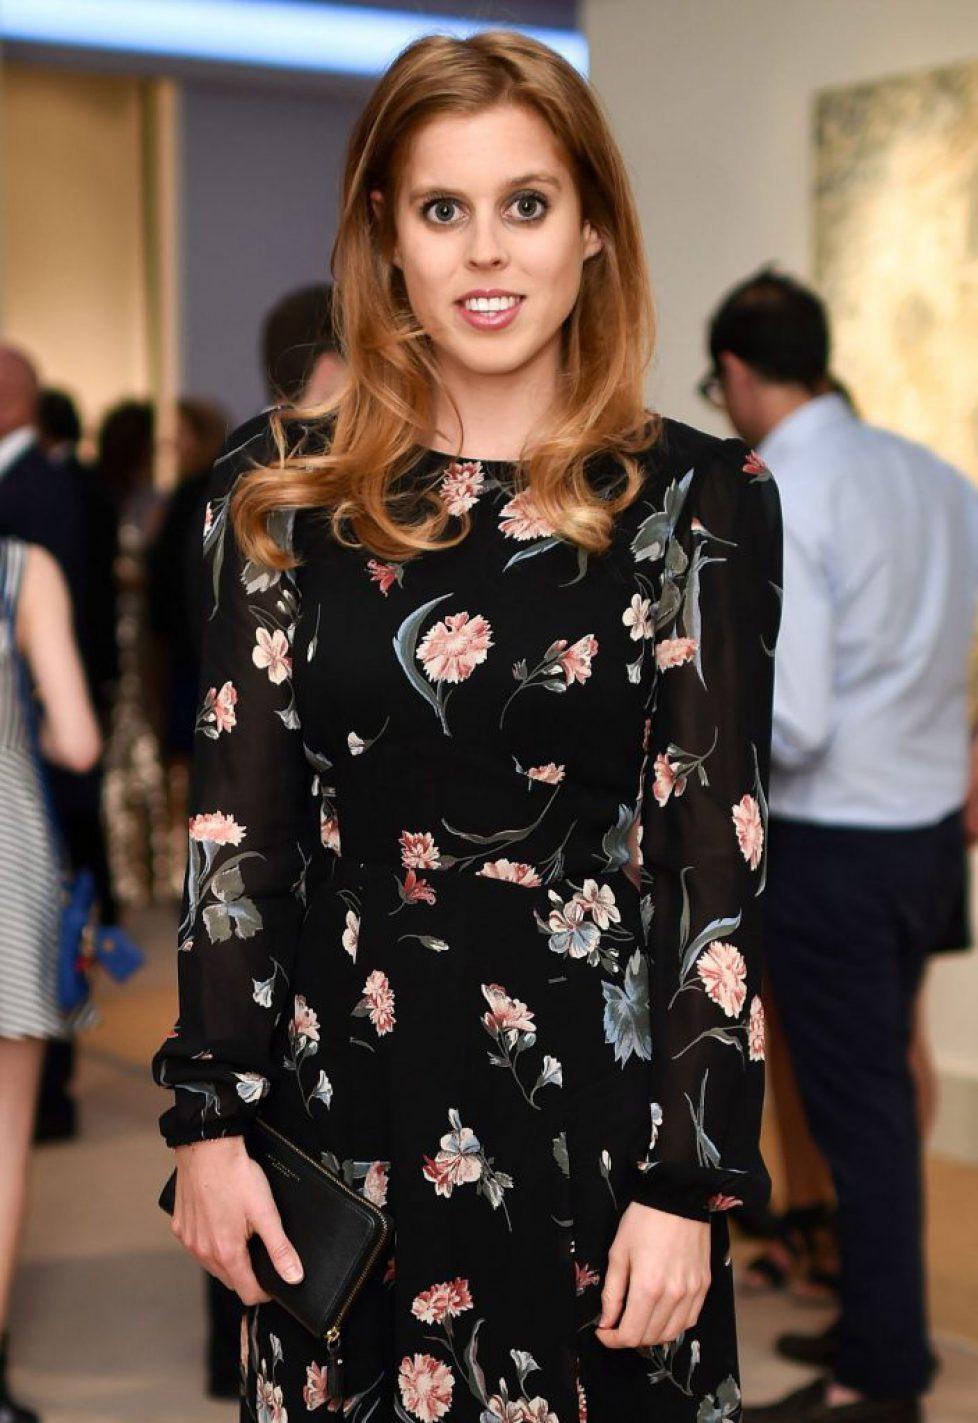 NSPCC Neo-Romantic Art Gala at Royal Hospital Chelsea, London, Britain - 30 Jun 2015